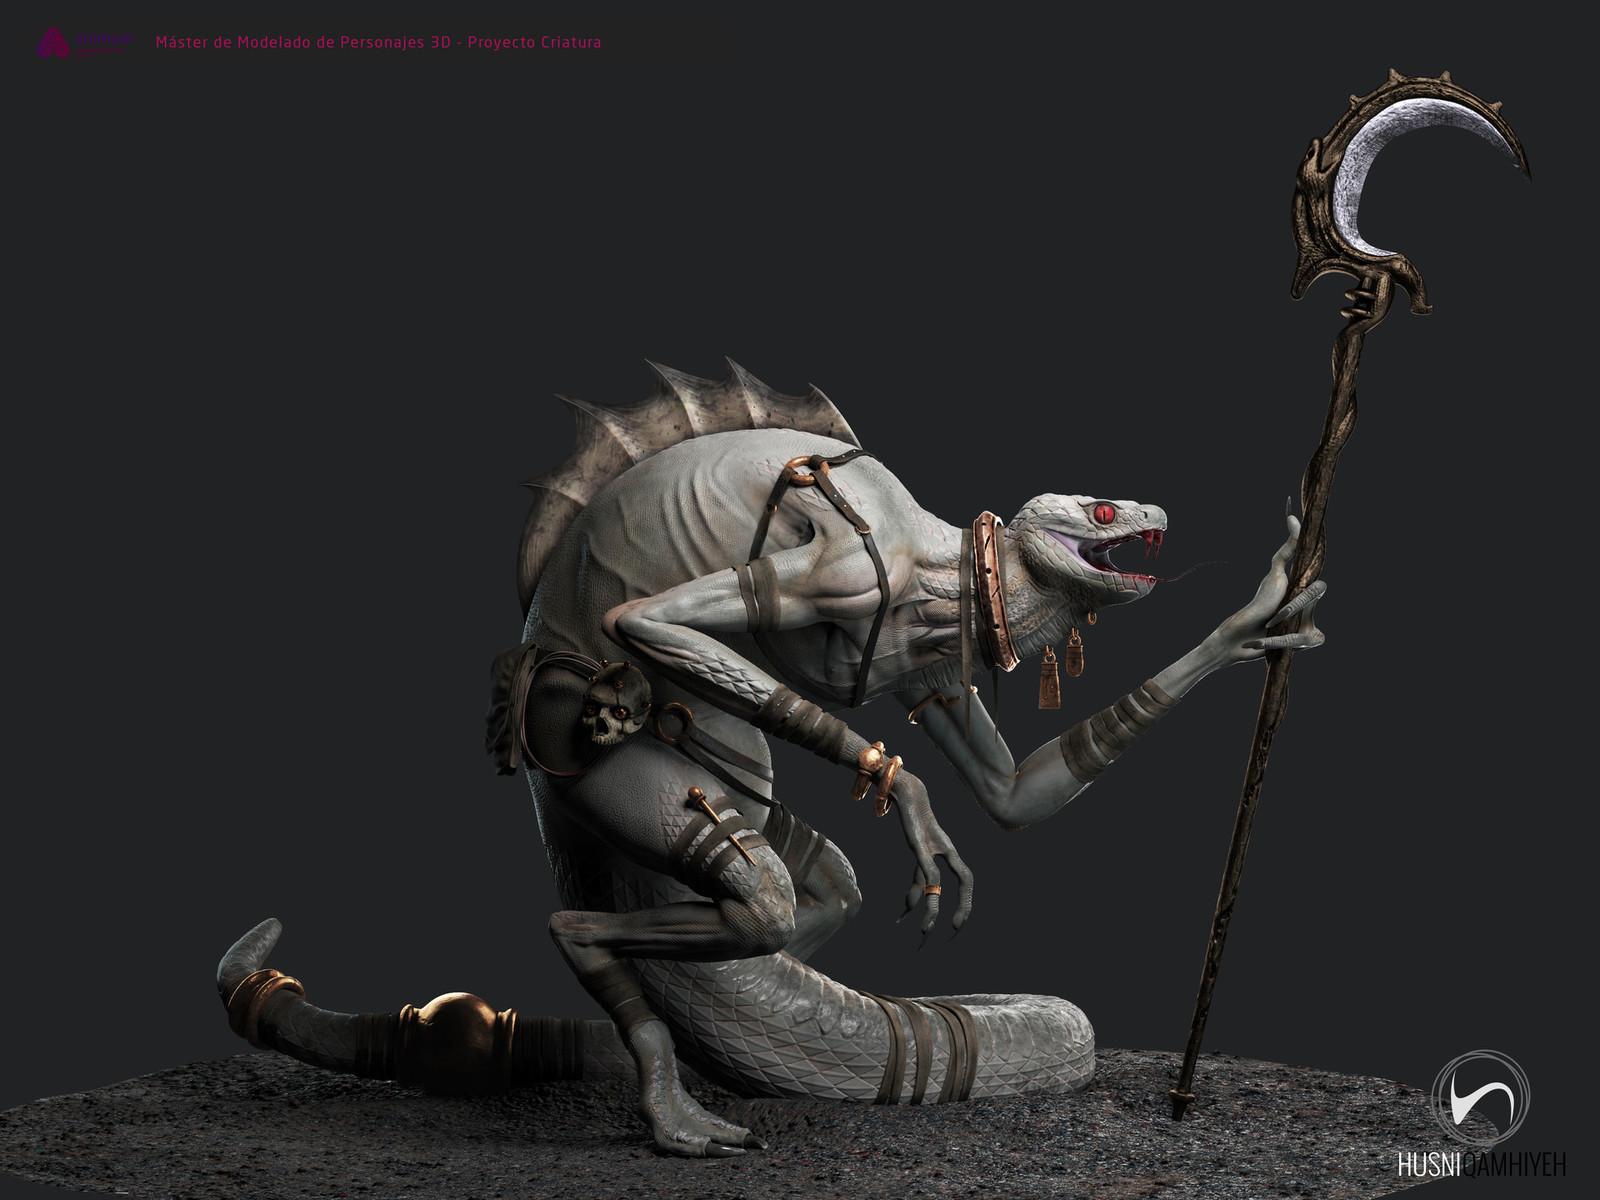 3D model by Husni Qamhiyeh https://www.artstation.com/artwork/zq6NZ